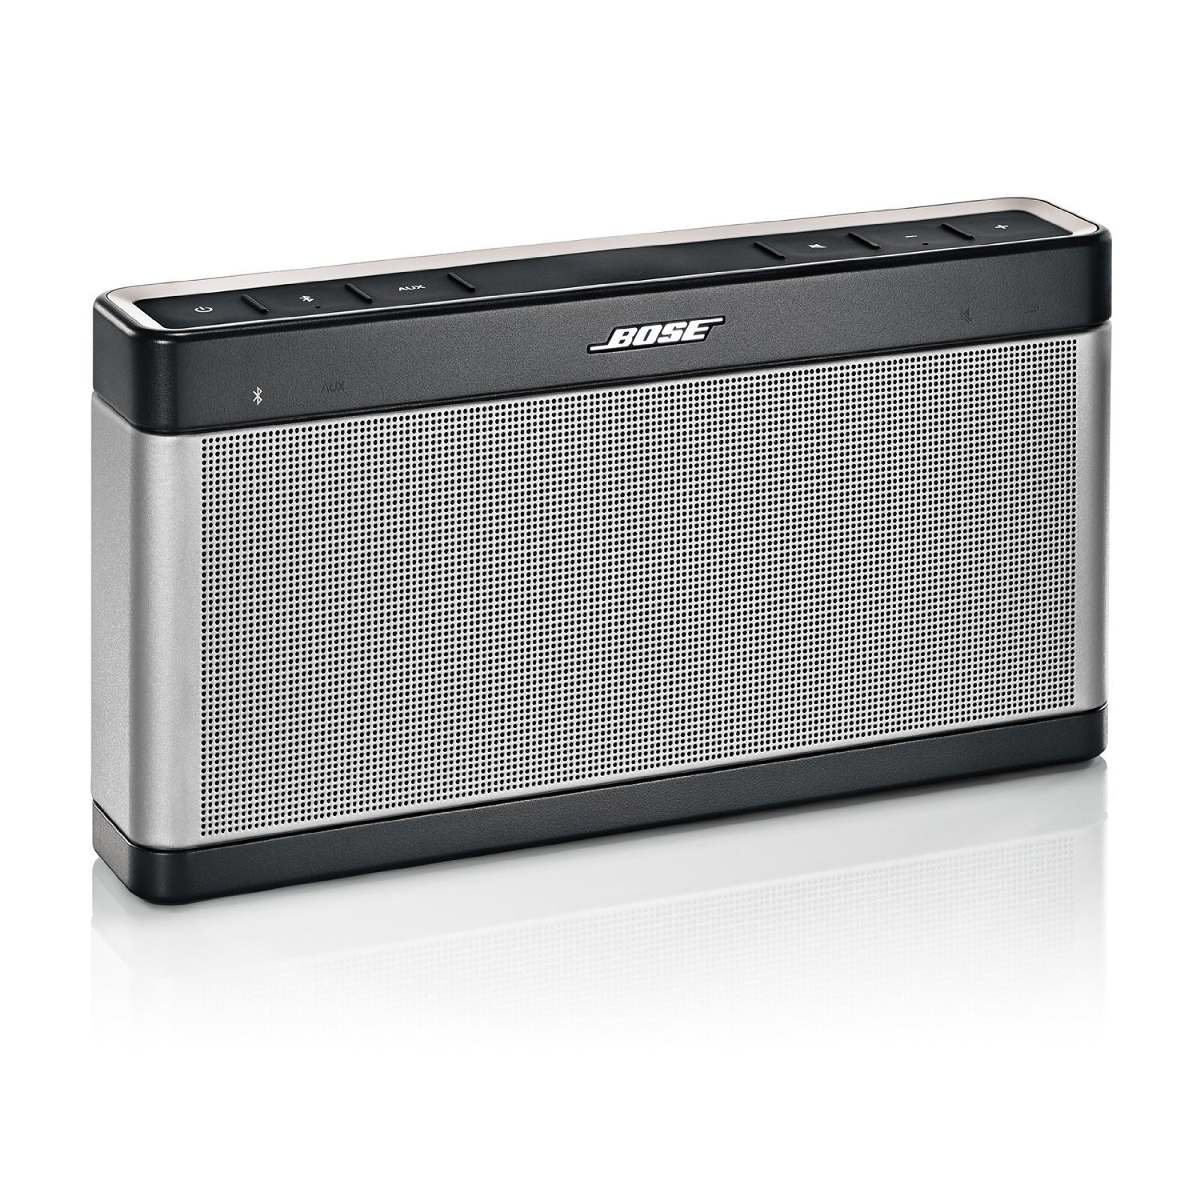 caixa de som bose soundlink bluetooth speaker iii r no mercadolivre. Black Bedroom Furniture Sets. Home Design Ideas